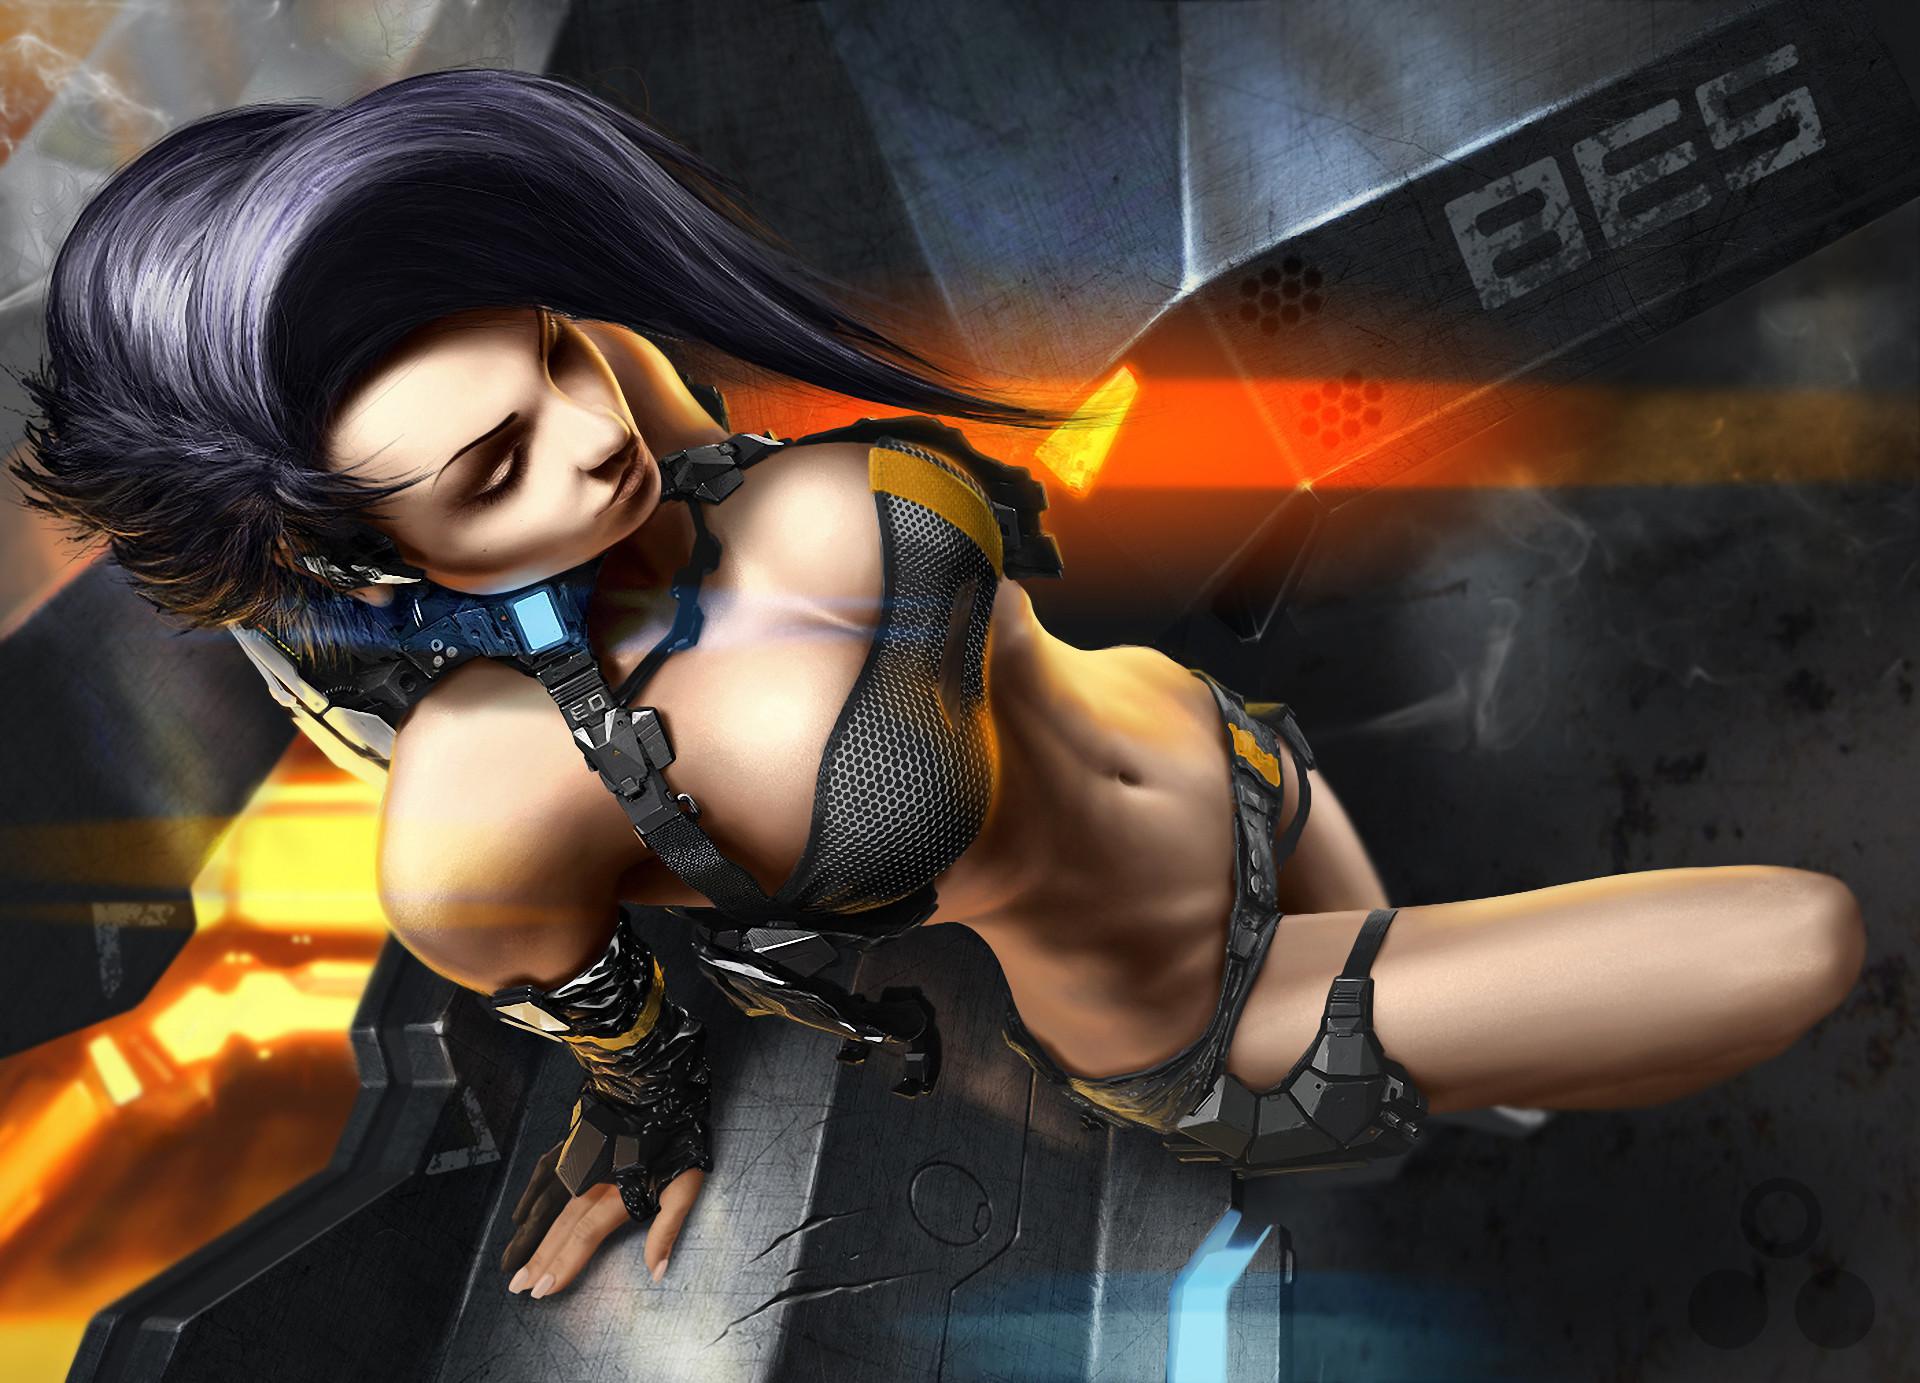 women, CGI, Fantasy Art. Sexy